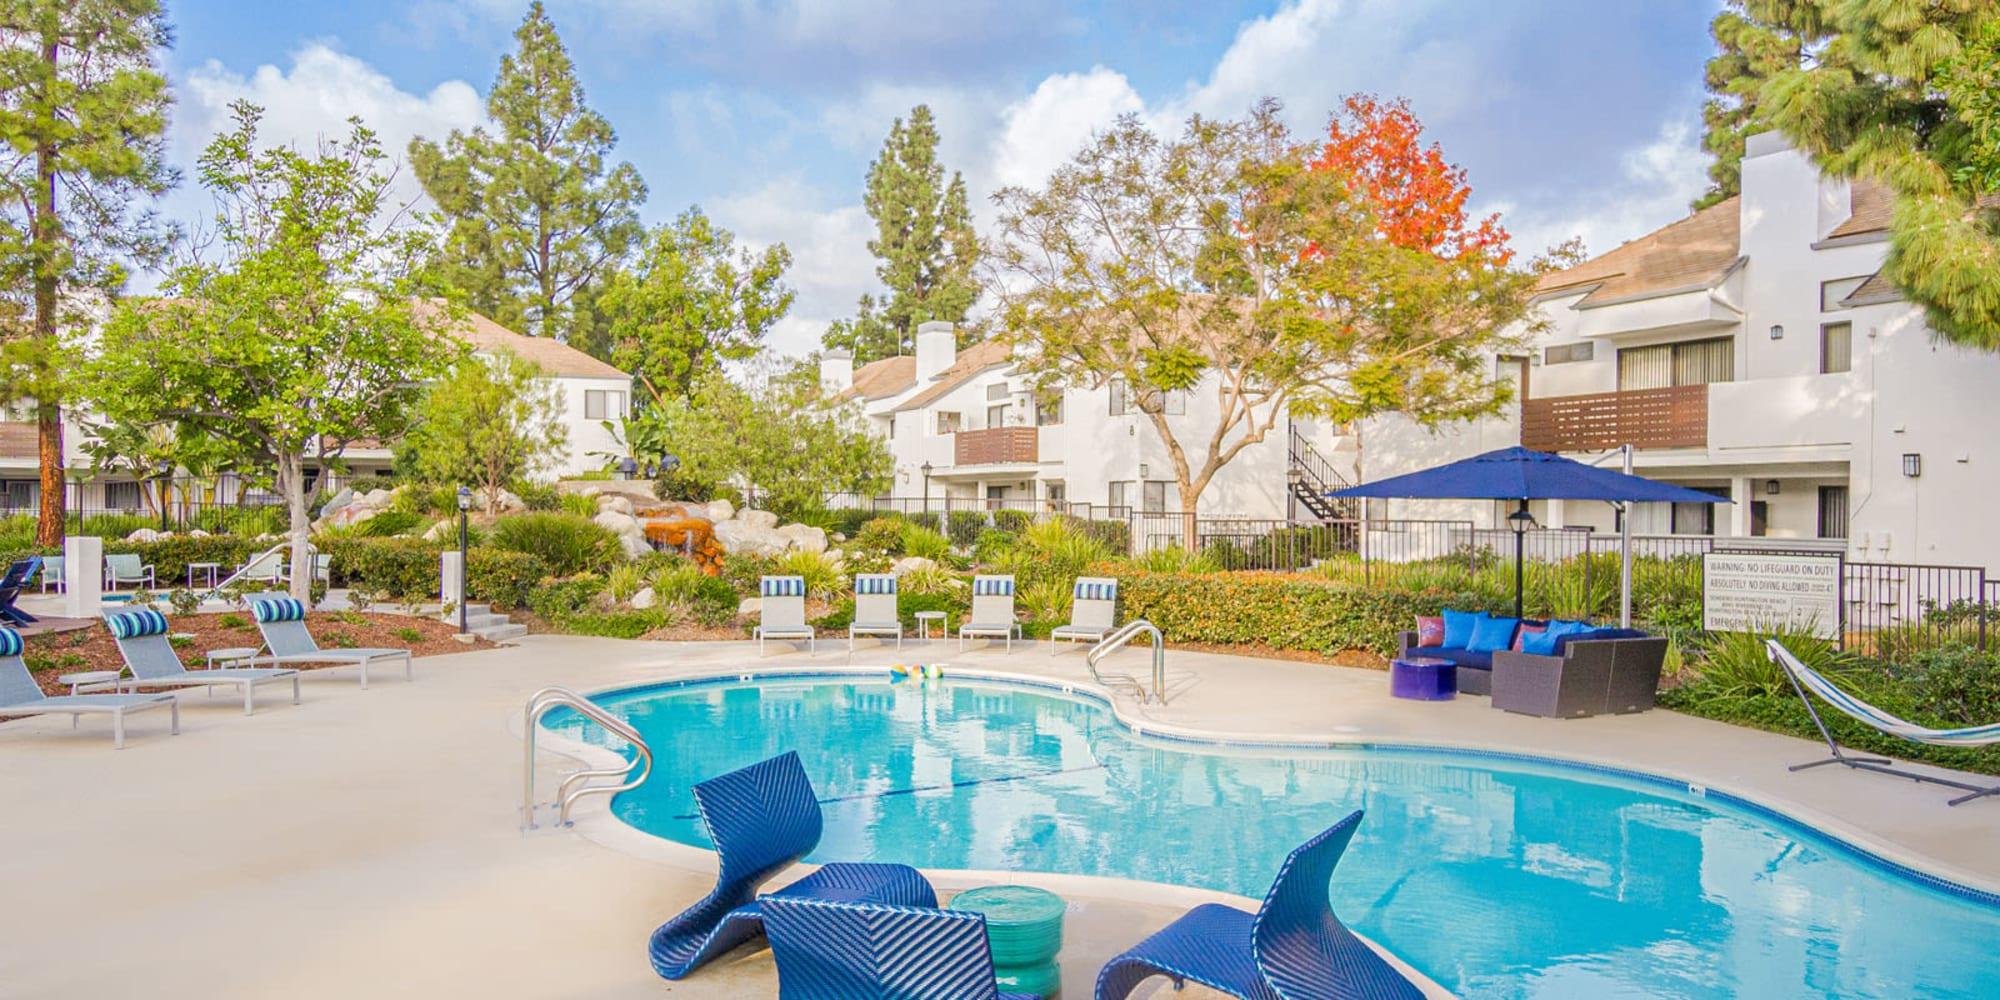 Ample seating areas around the swimming pool at Sendero Huntington Beach in Huntington Beach, California